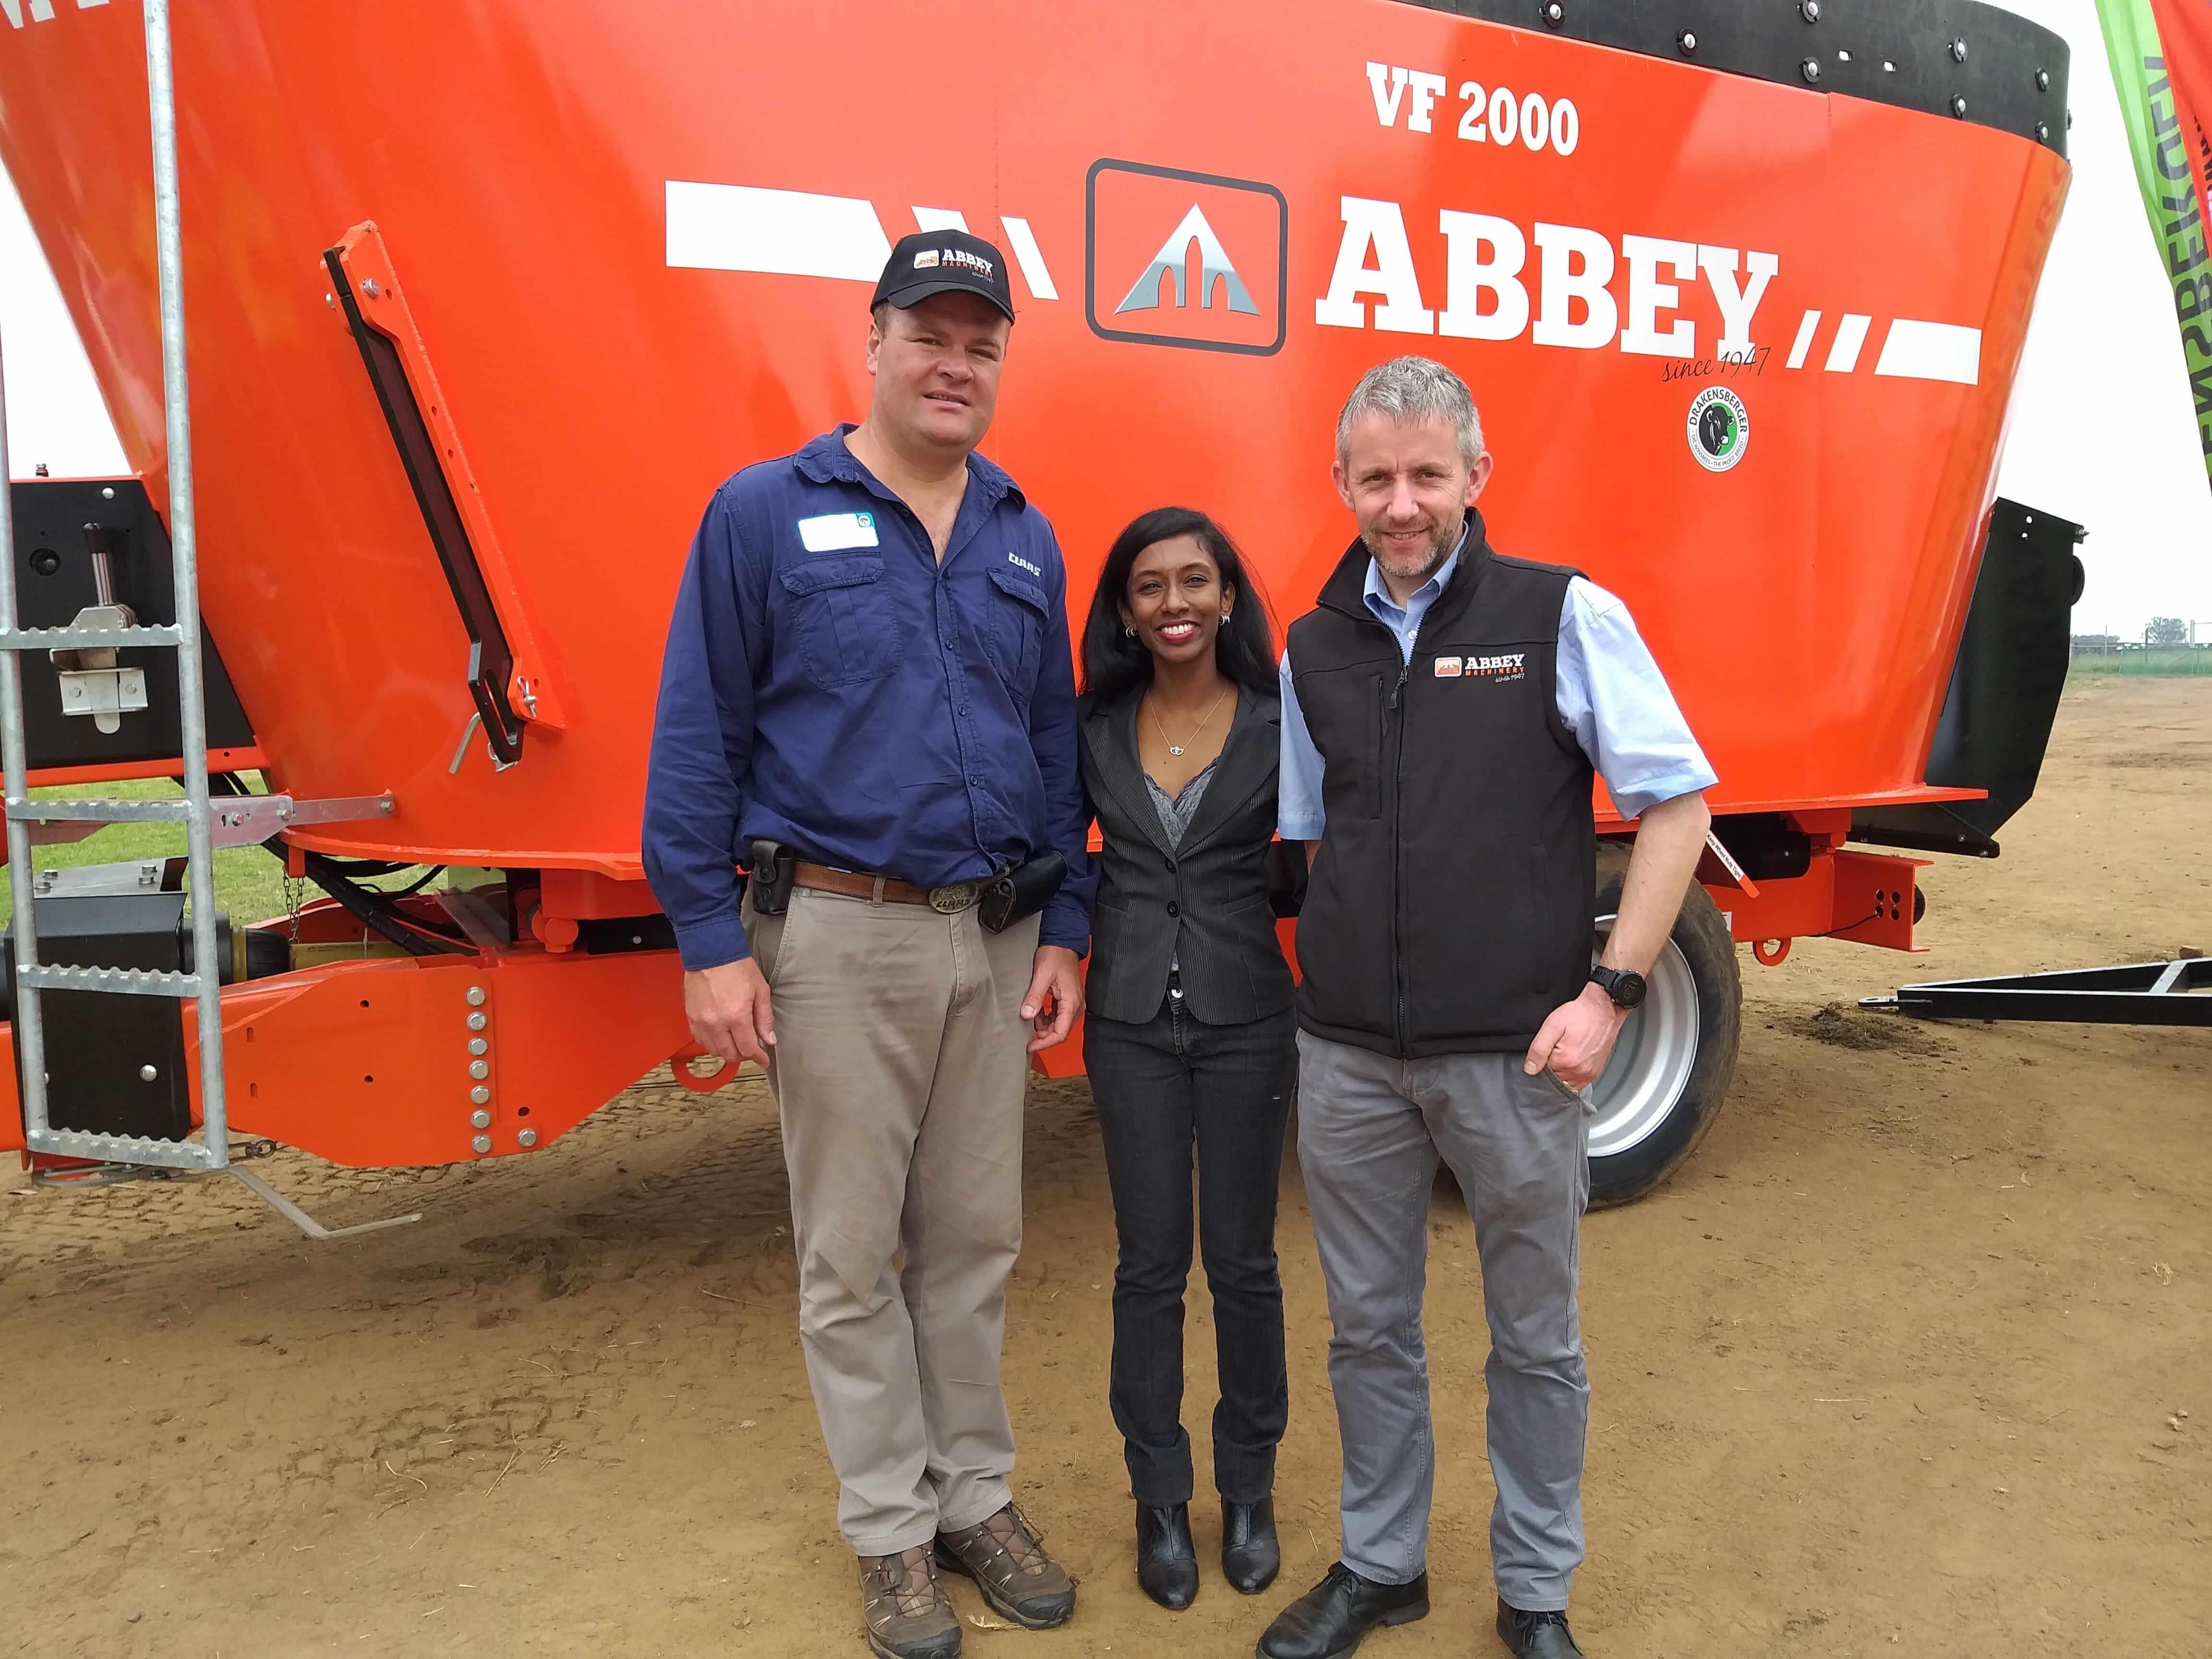 Nico von Wielligh (South African dealer), Ureshnie Govender (Enterprise Ireland) and Micheal O'Grady (Abbey Machinery).